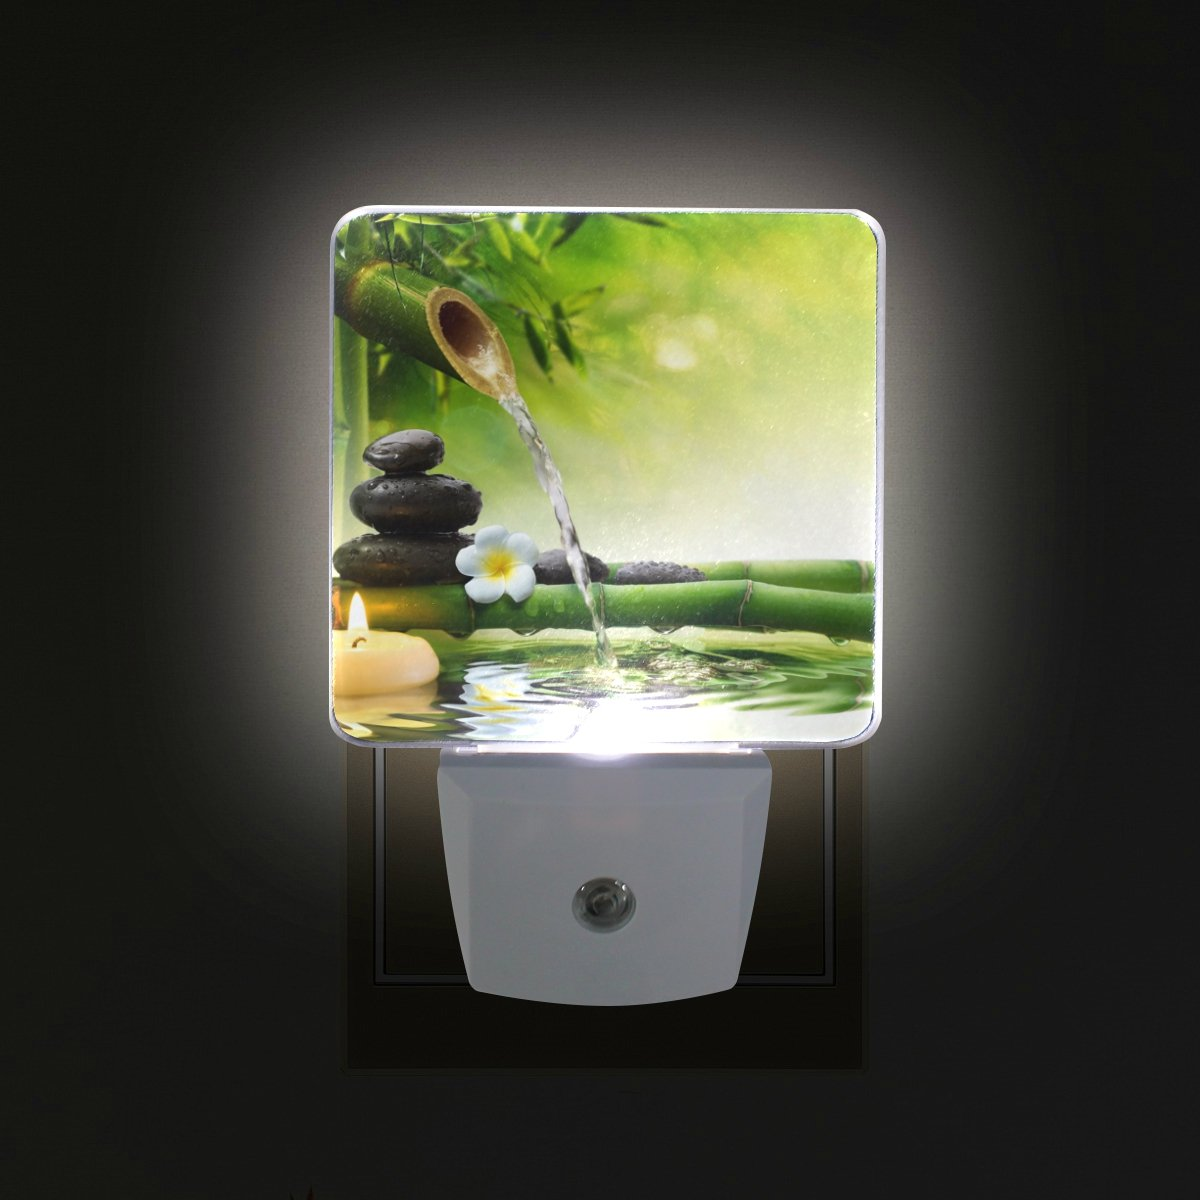 ALIREA Spa Stones Plug in LED Night Light Auto Sensor Smart Dusk to Dawn Decorative Night for Bedroom, Bathroom, Kitchen, Hallway, Stairs,Hallway,Baby's Room, Energy Saving